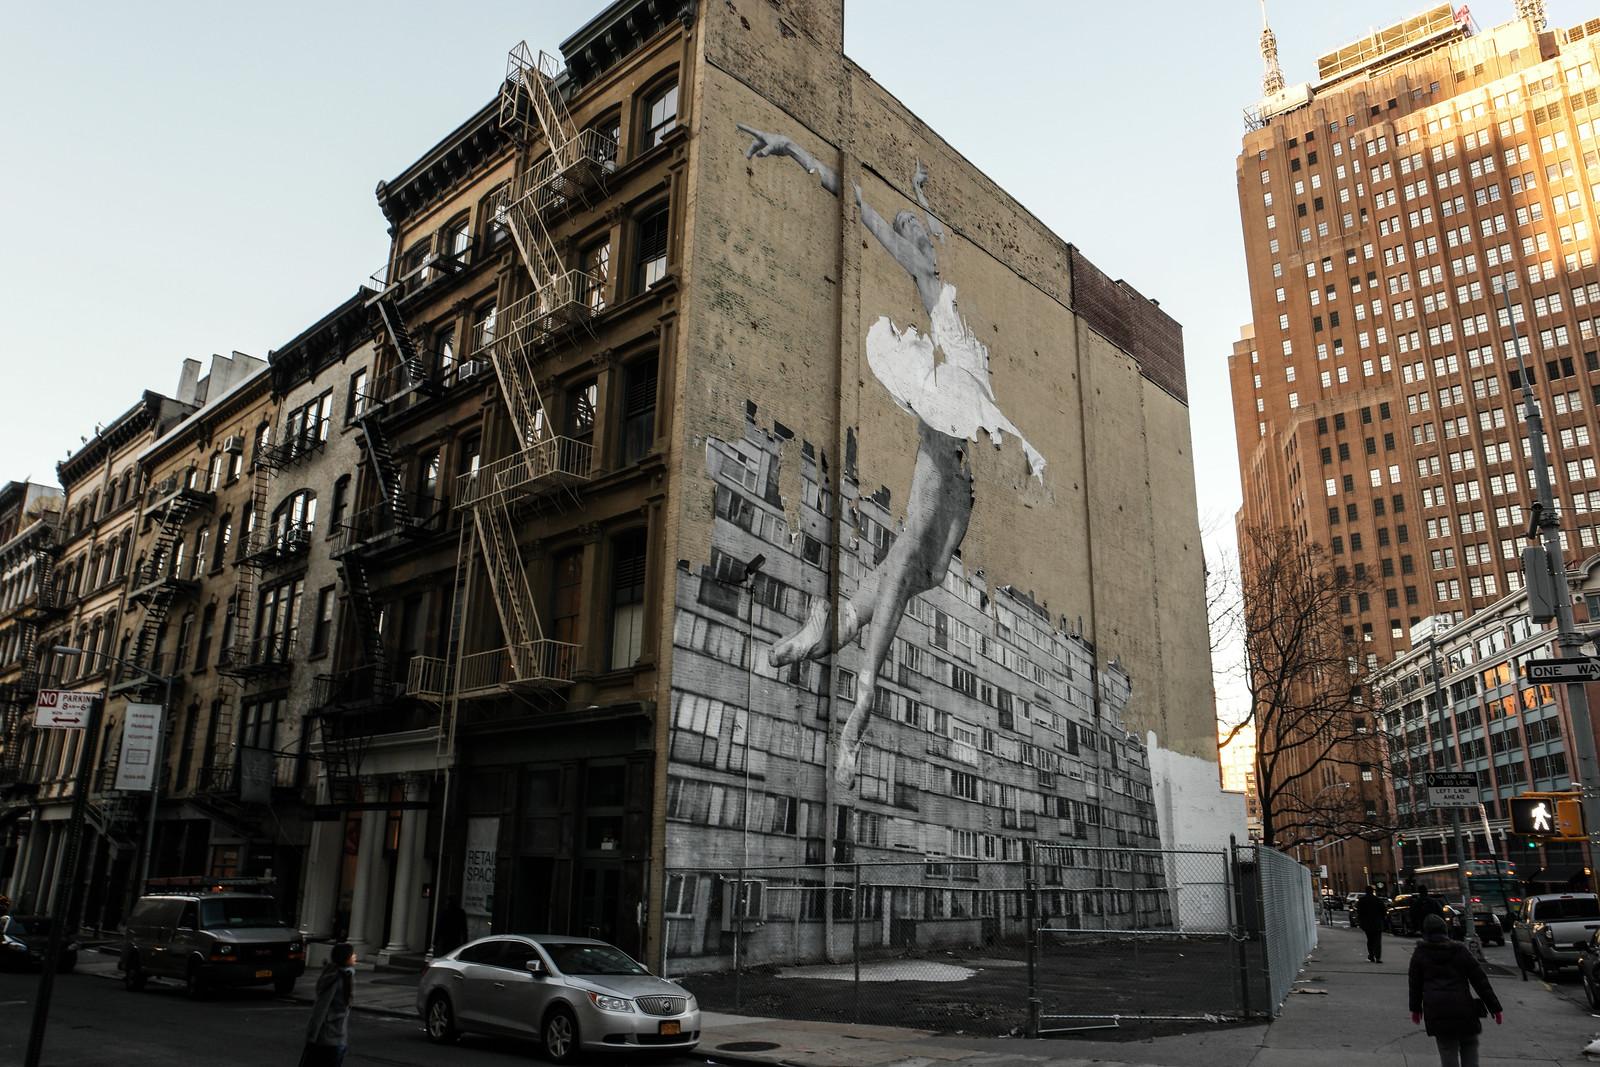 Ballerina on a Building